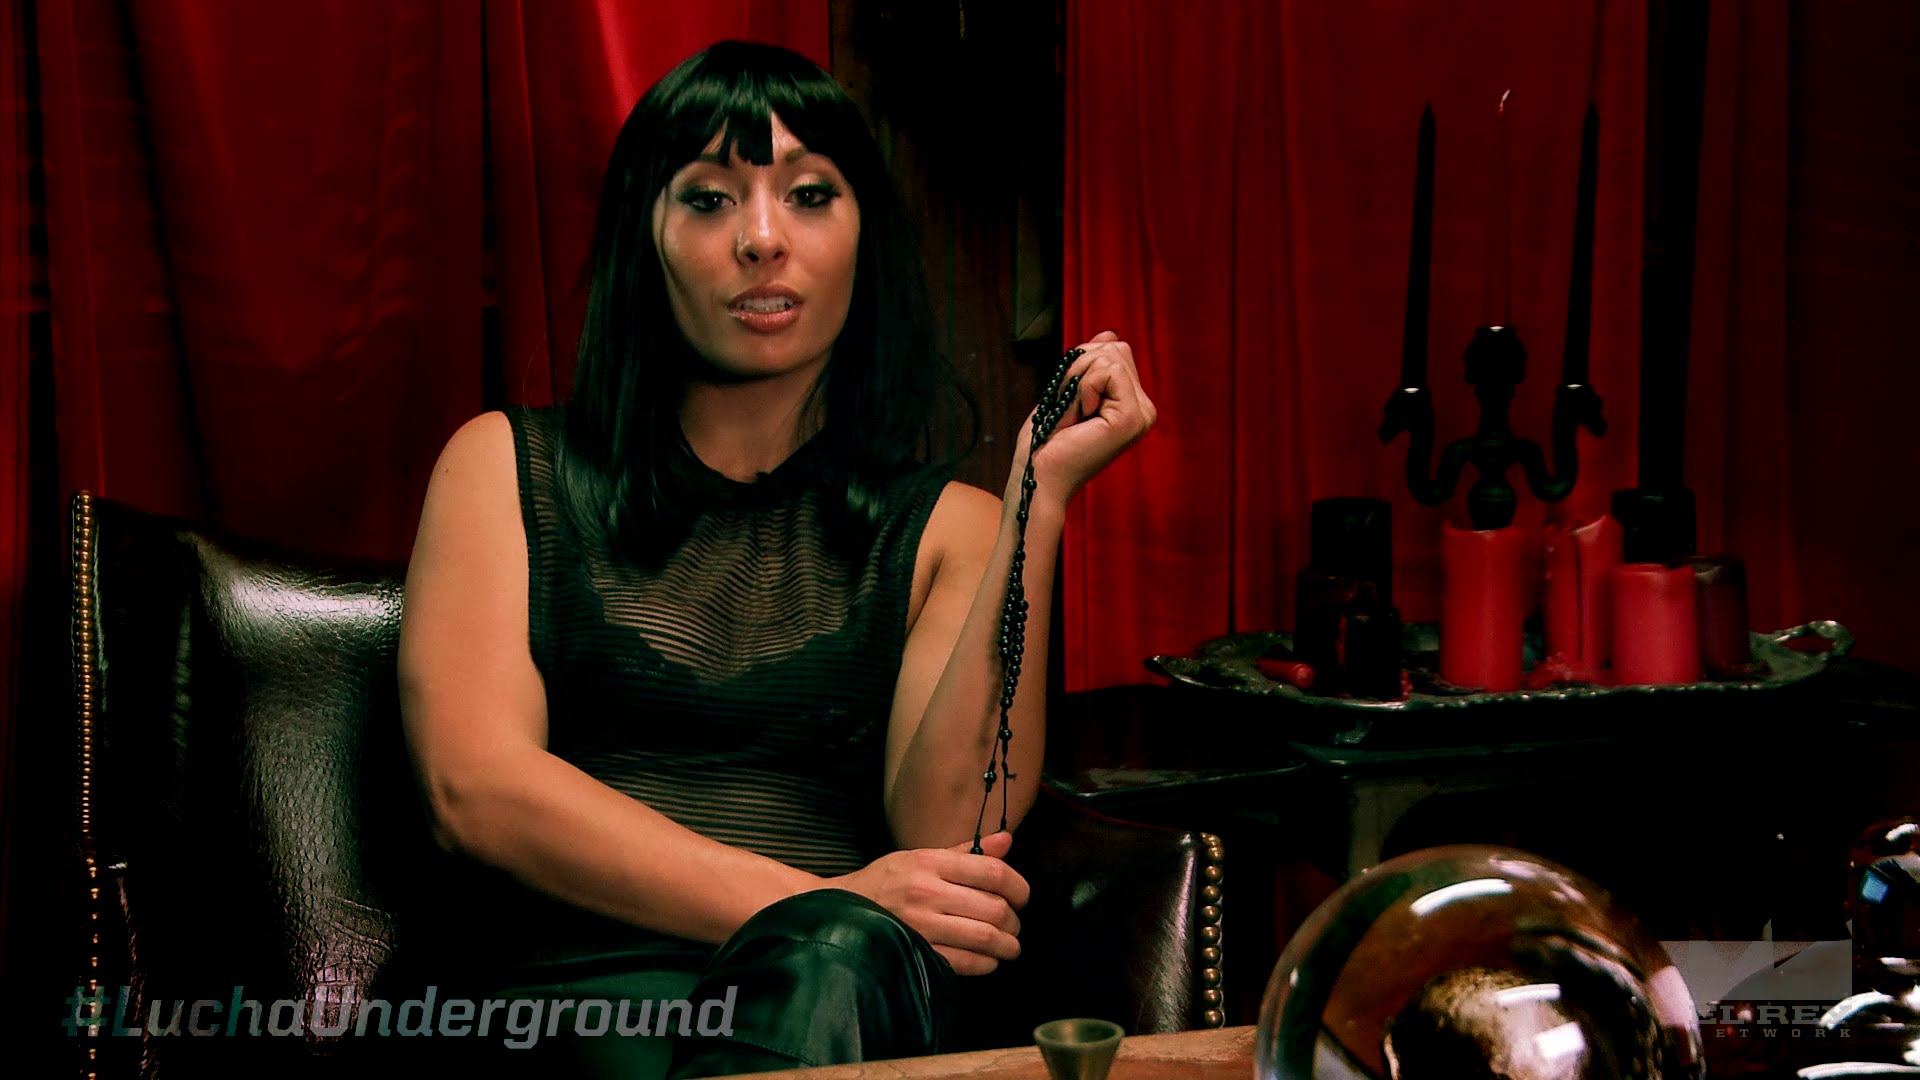 Karlee Perez as ' Catrina' on  Lucha Underground